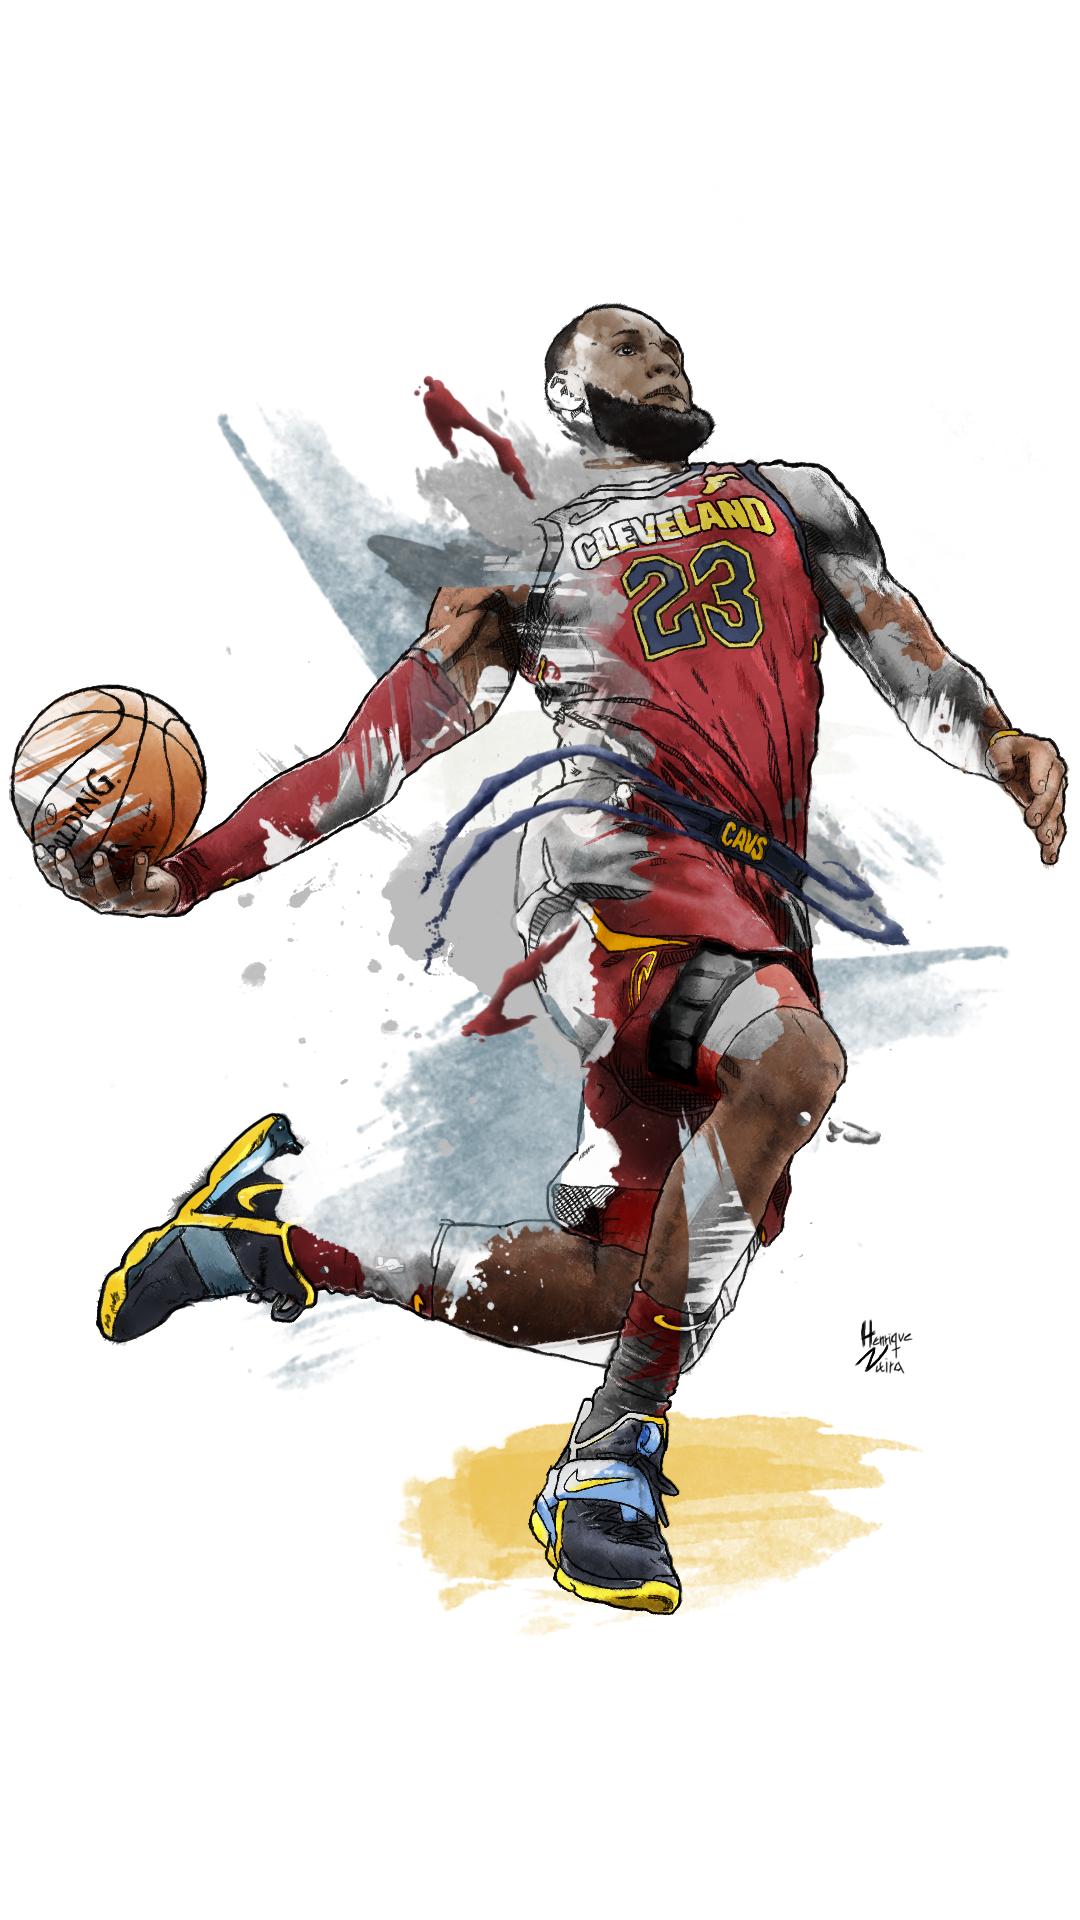 Lebron James Artwork Ver 2 Lebron James Artwork Basketball Desenho Basquete 2019 2018 2017 2016 La Desenhos De Basquete Arte De Basquete Tatuagens De Basquete